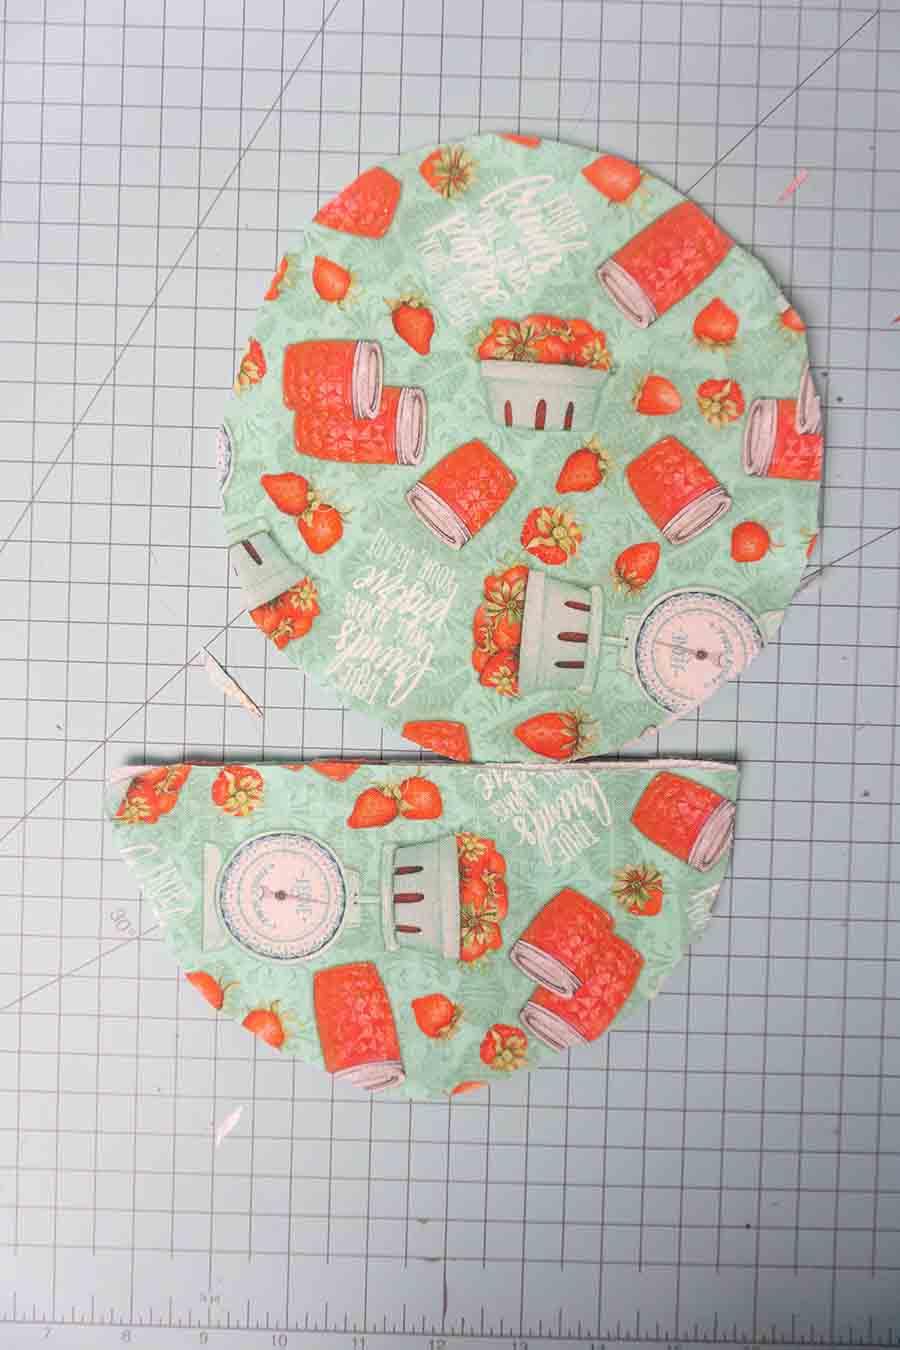 Cut fabrics from pattern